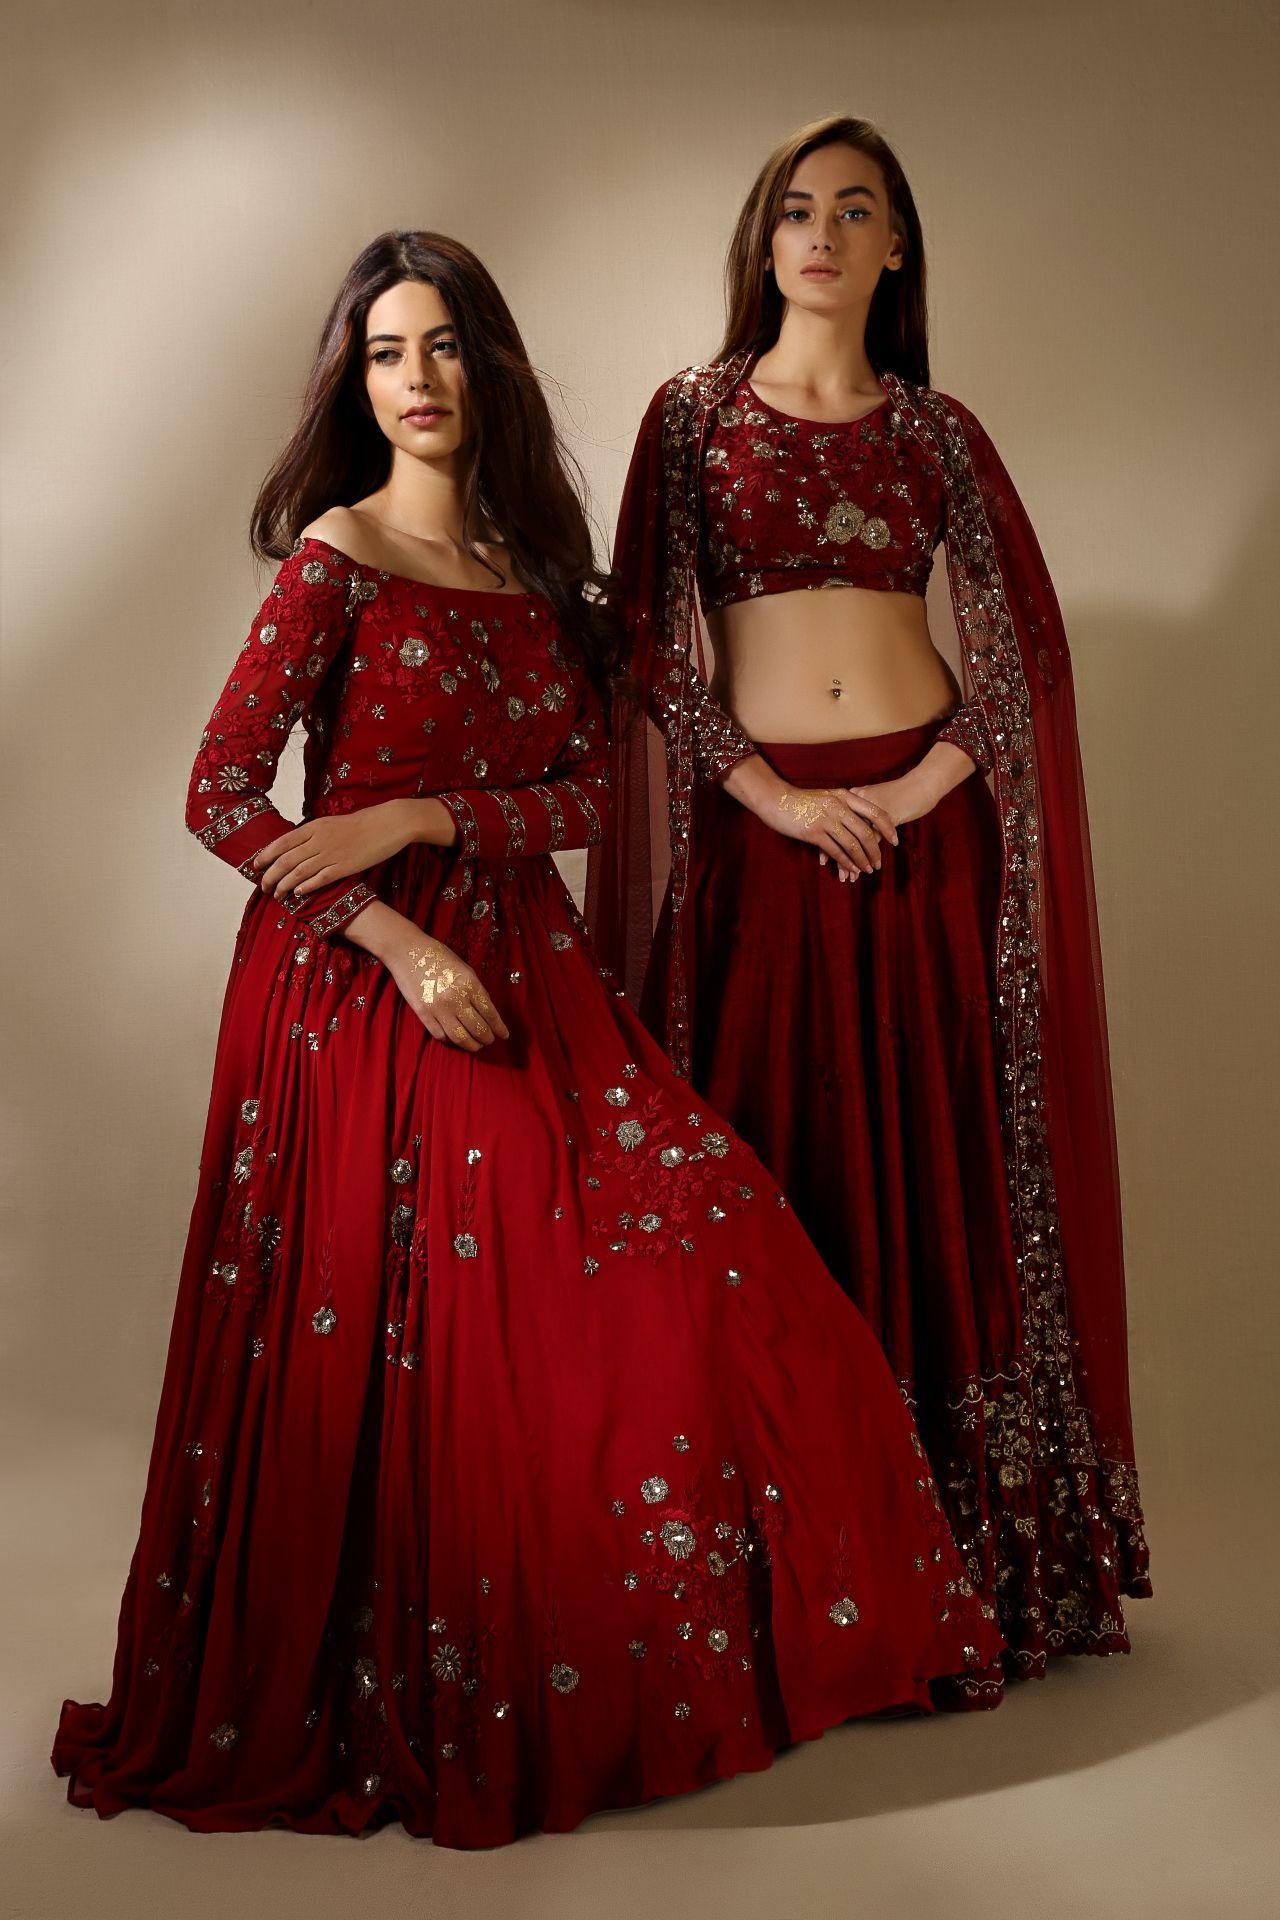 67fc44e247 Indian Red & Gold Dresses/Lehenga Cholis | Beautiful & Elegant | Designed by  Asthana Rang